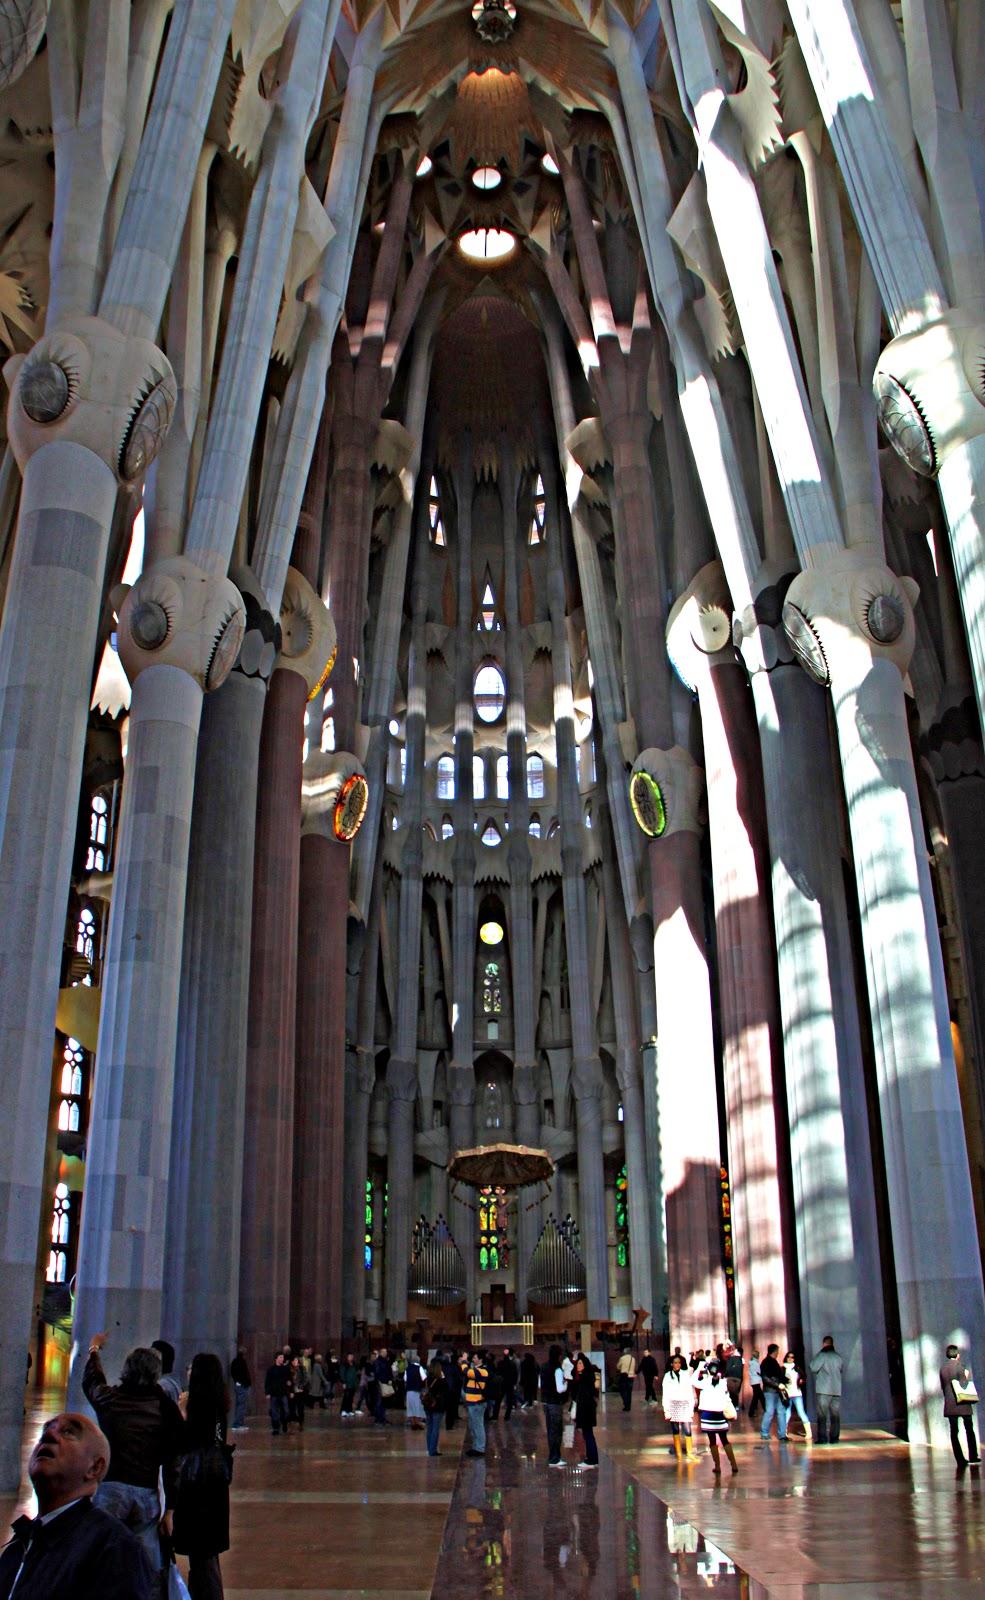 Sagrada Familia: Being Is Good: Gaudi, Sagrada Familia, Sainthood & More